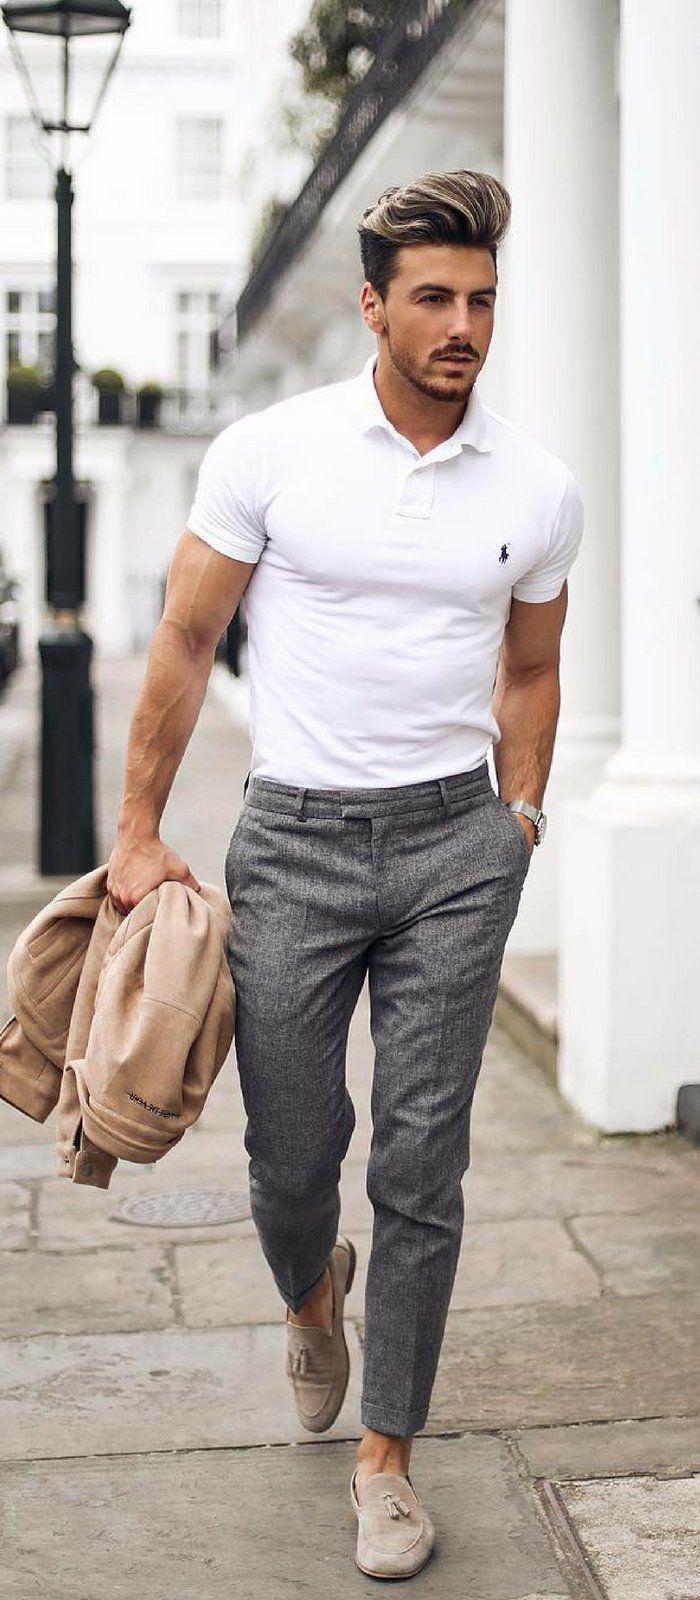 Summer Fashion 2018 : Business casual men Men's Fashion | #MichaelLouis - www.MichaelLouis.com - Bronxbomber211 #minimalclothing